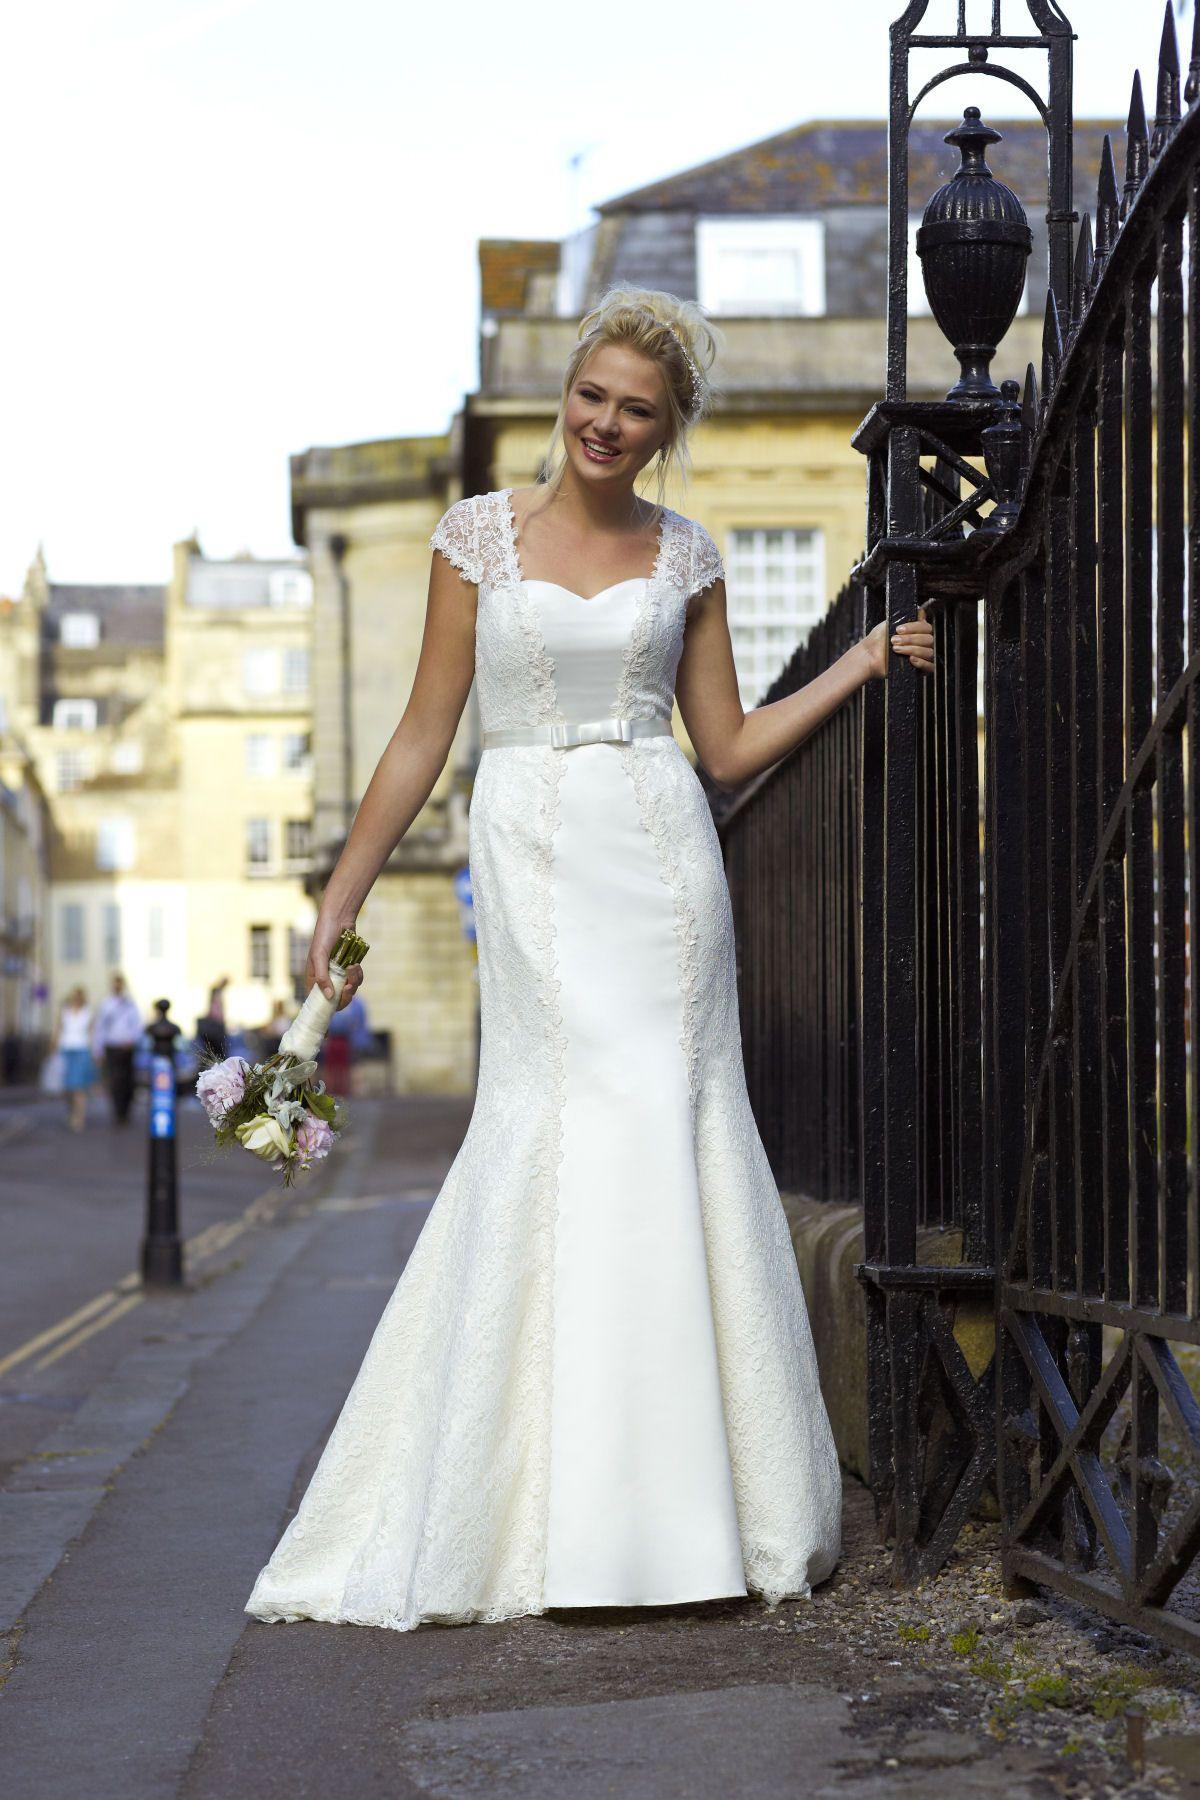 Lola\', stocked at Cotswold Bride, Cheltenham www.cotswoldbride.com ...